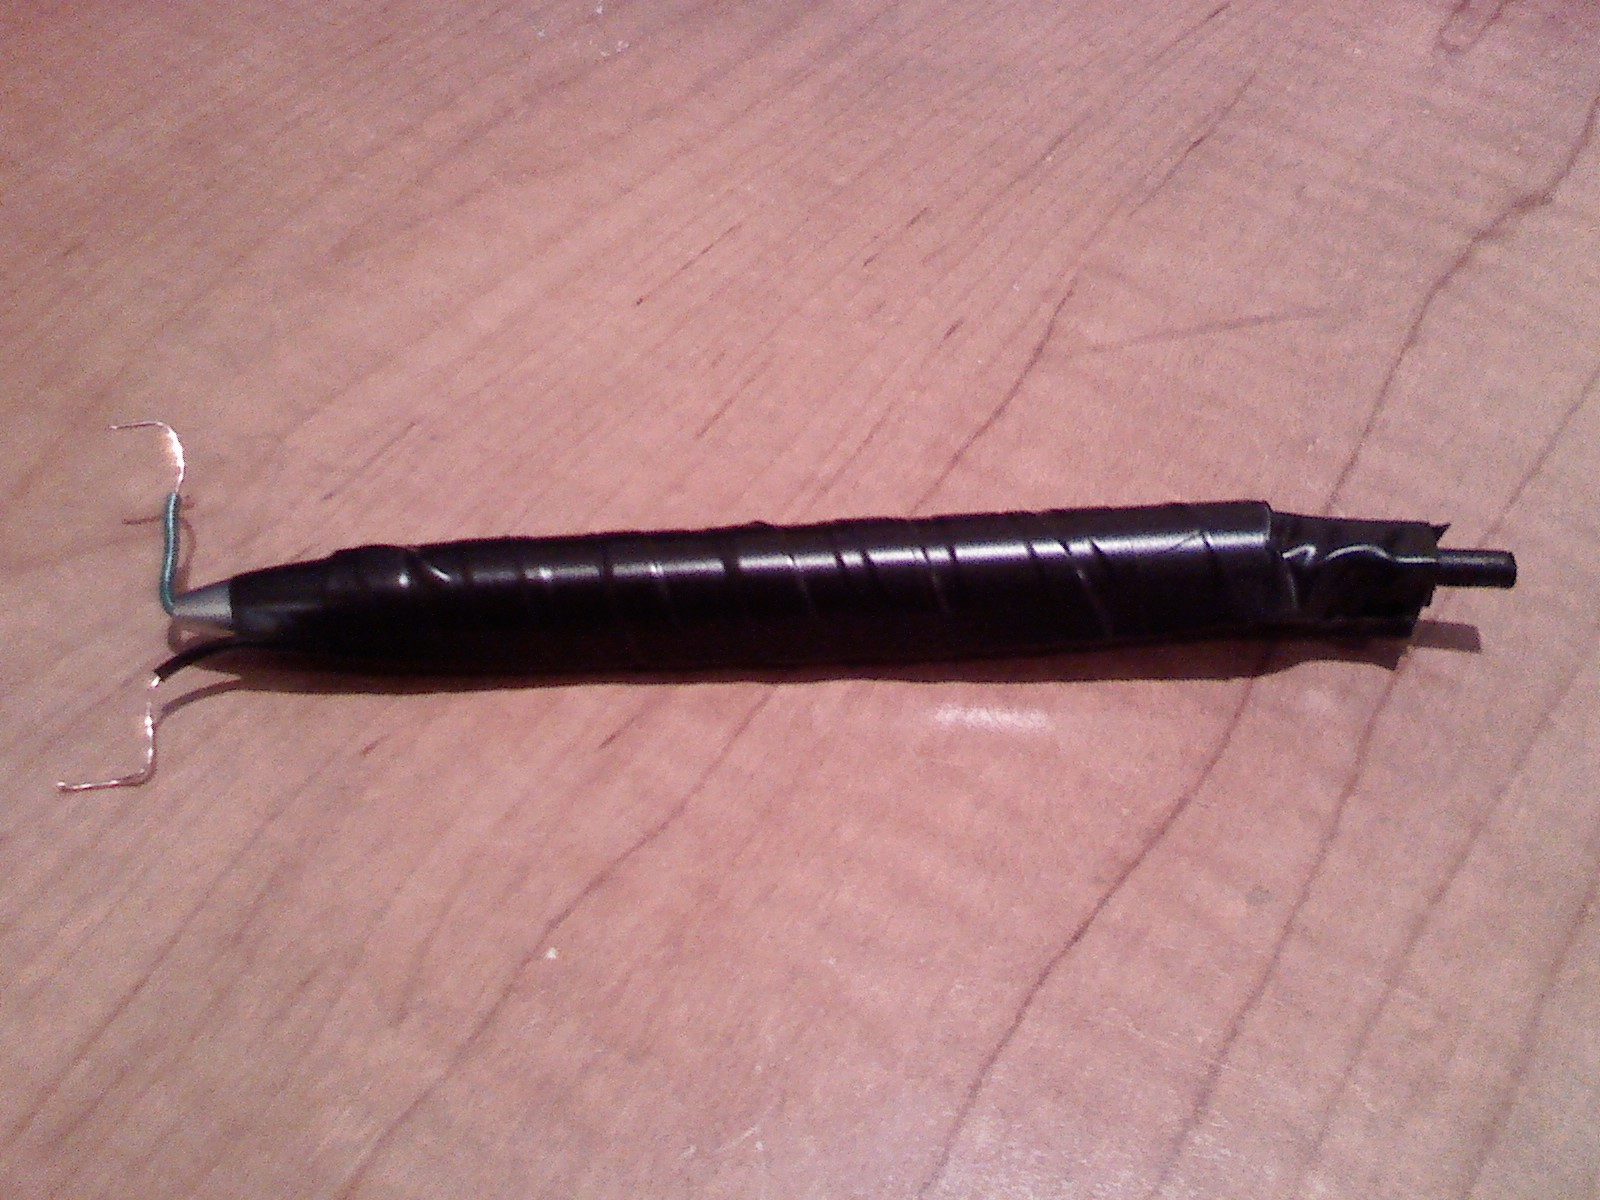 Simple Pen Taser ( Not a real taser, it shocks your friends! )